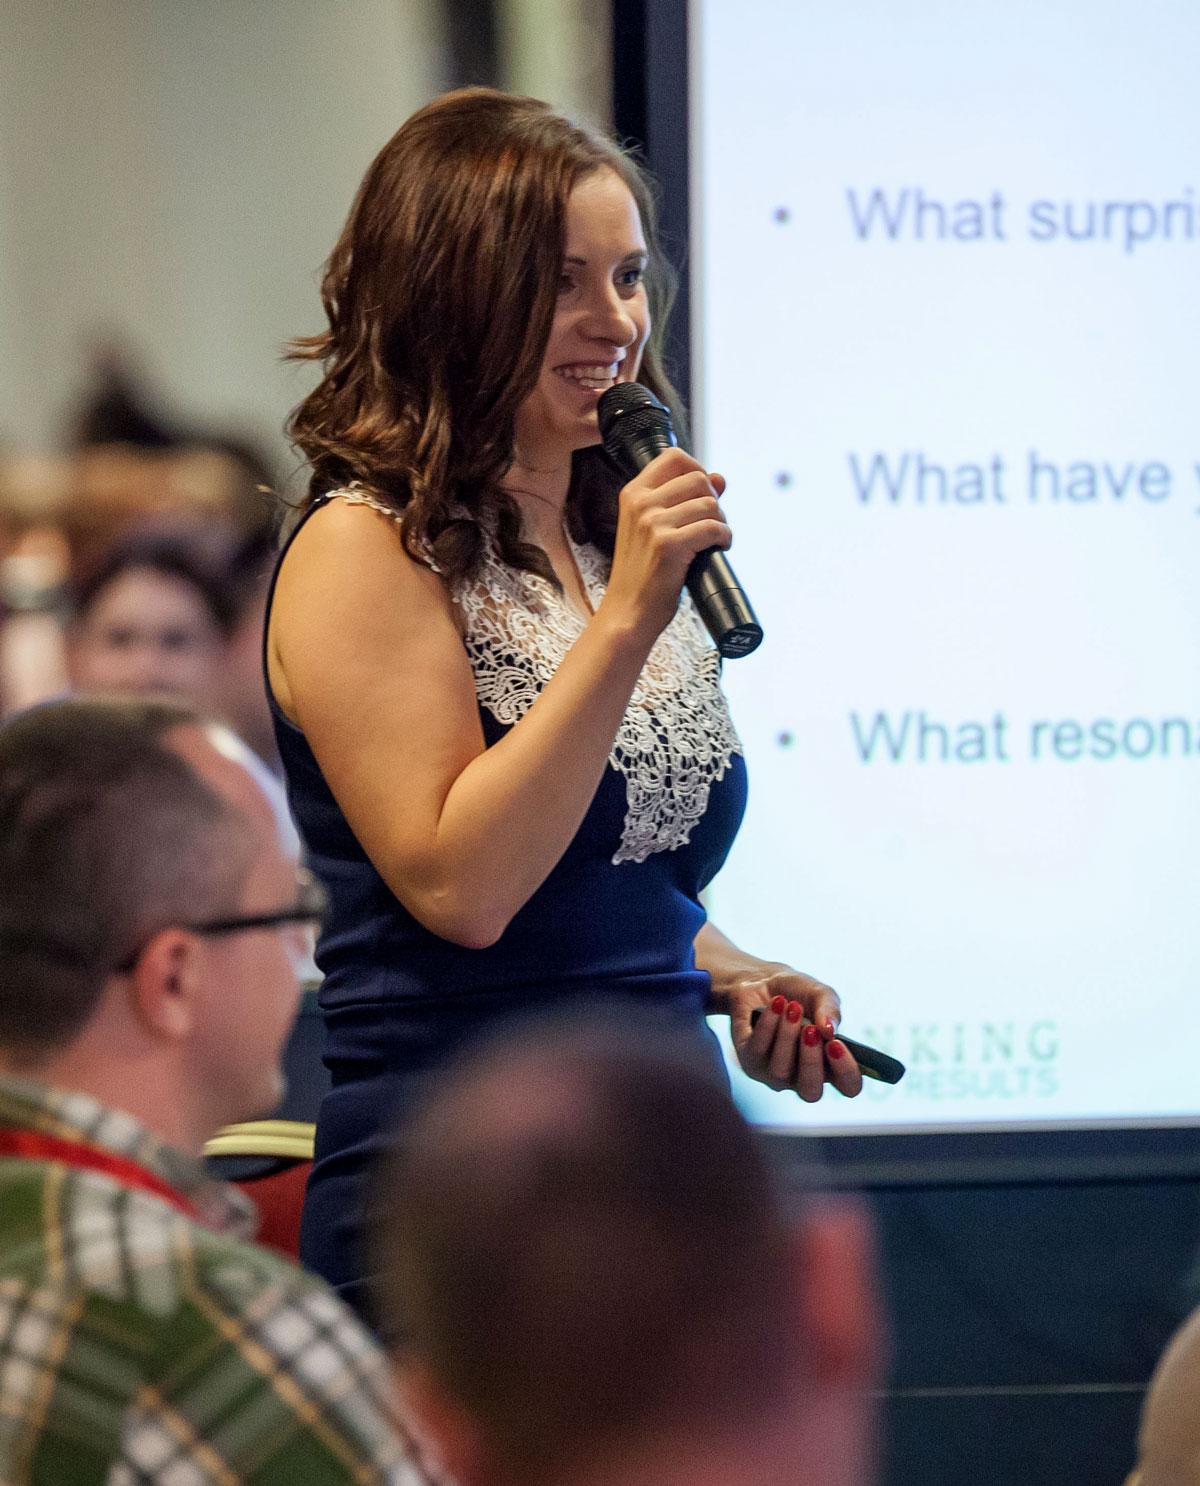 Ewa Public Speaking